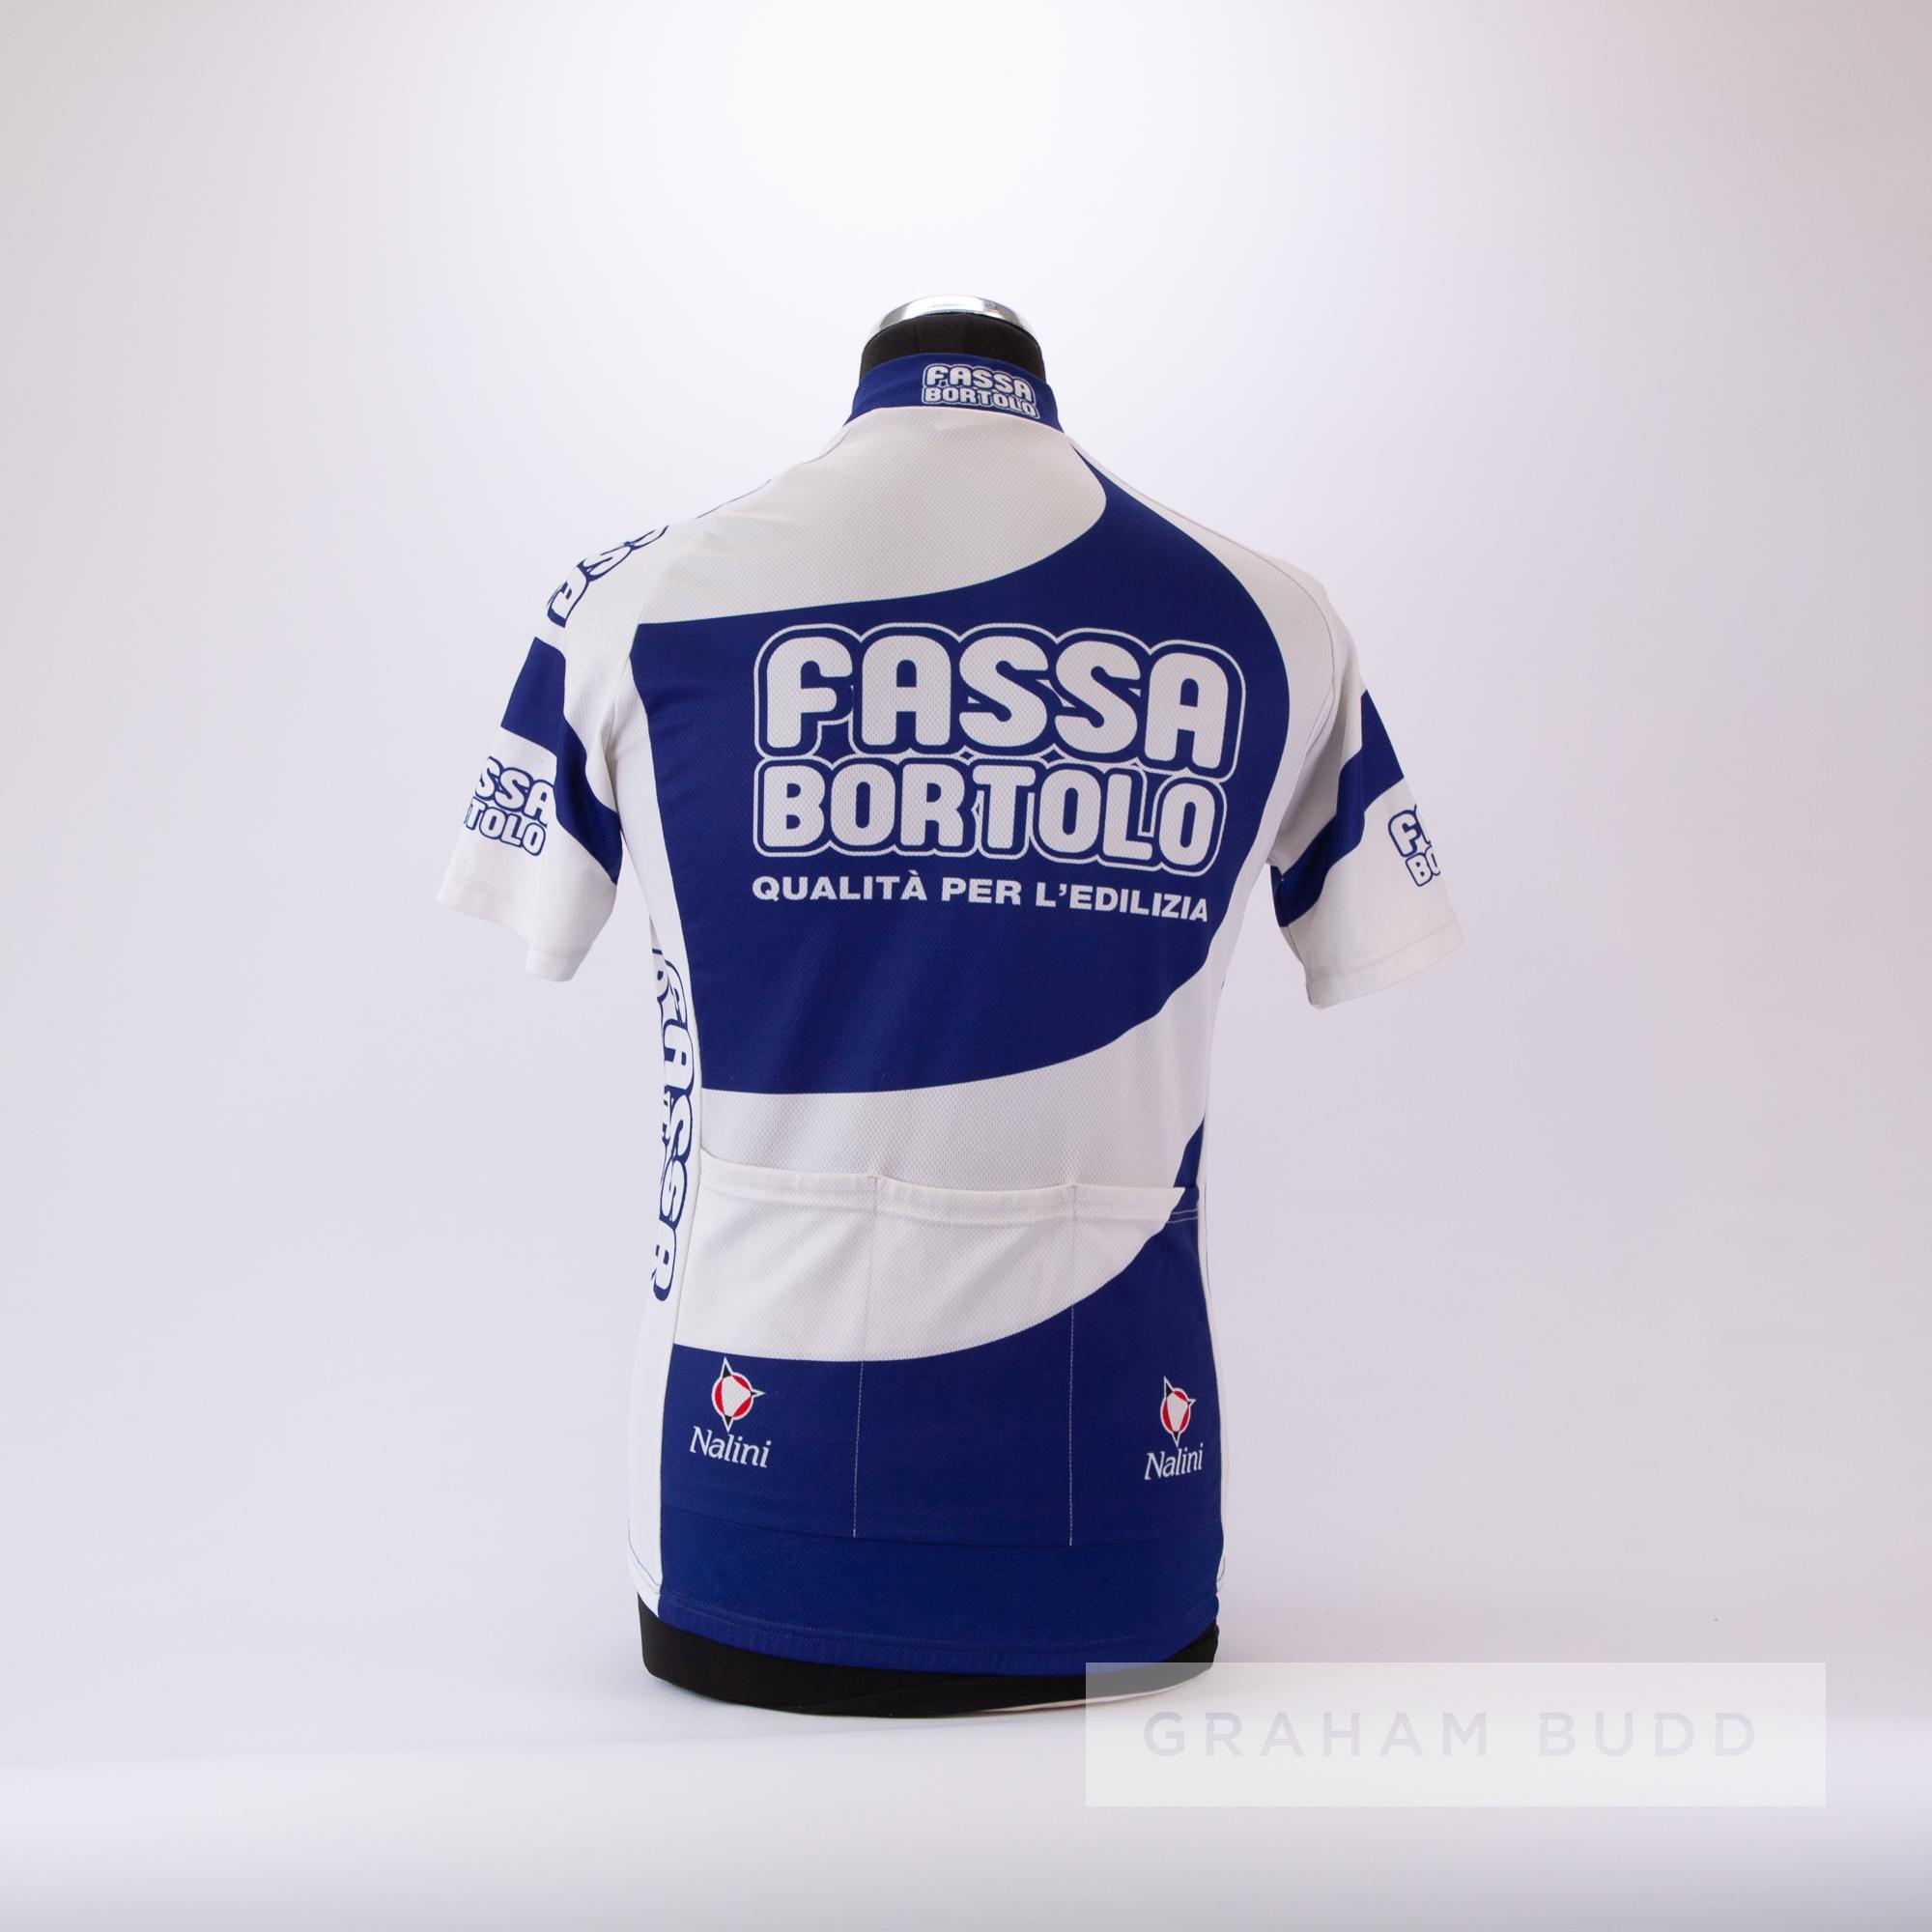 2000 white and blue Italian Fassa Bortolo Cycling race jersey, scarce, polyester short-sleeved - Image 4 of 4